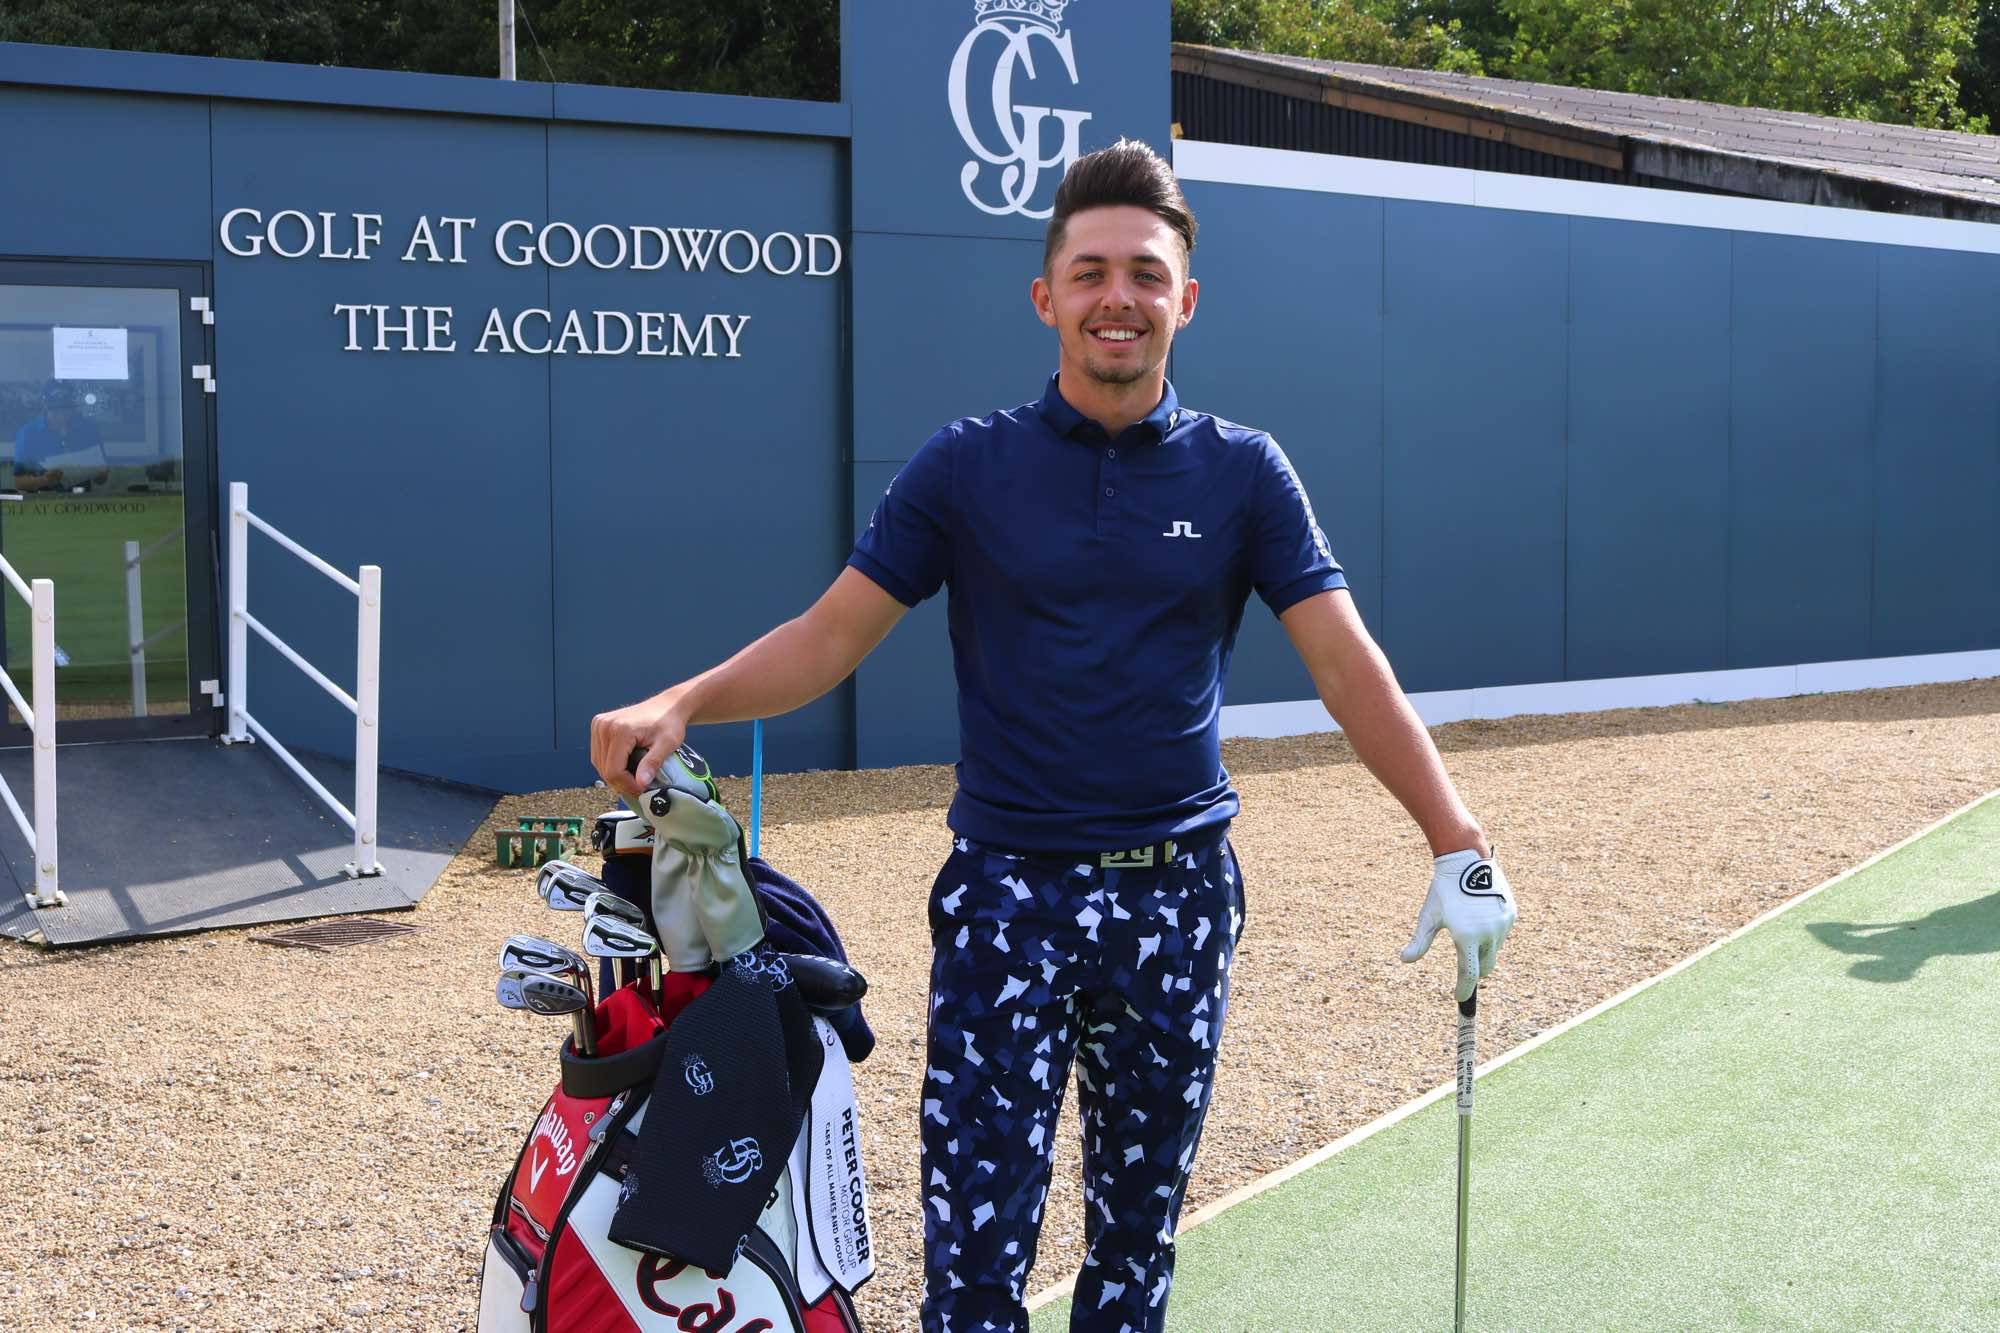 Marco Penge Golf